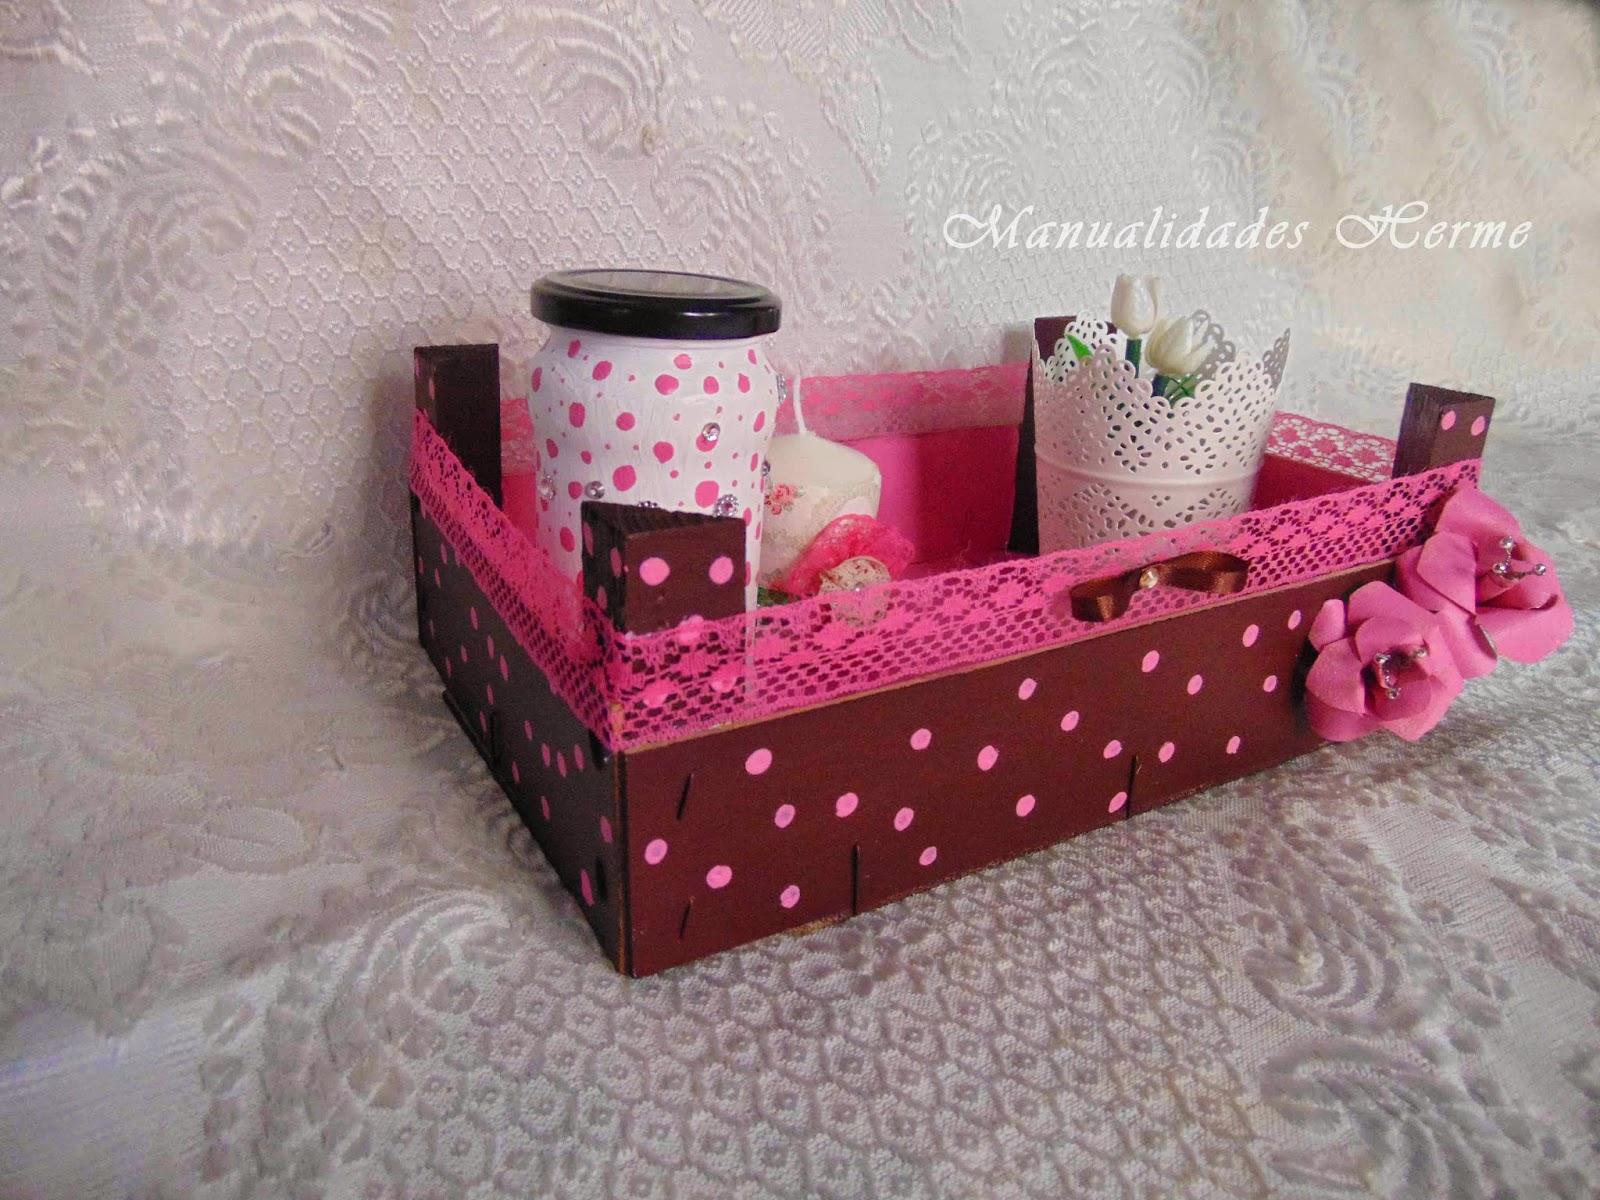 Manualidades herme diy caja de fruta decorada - Caja decorada con fotos ...